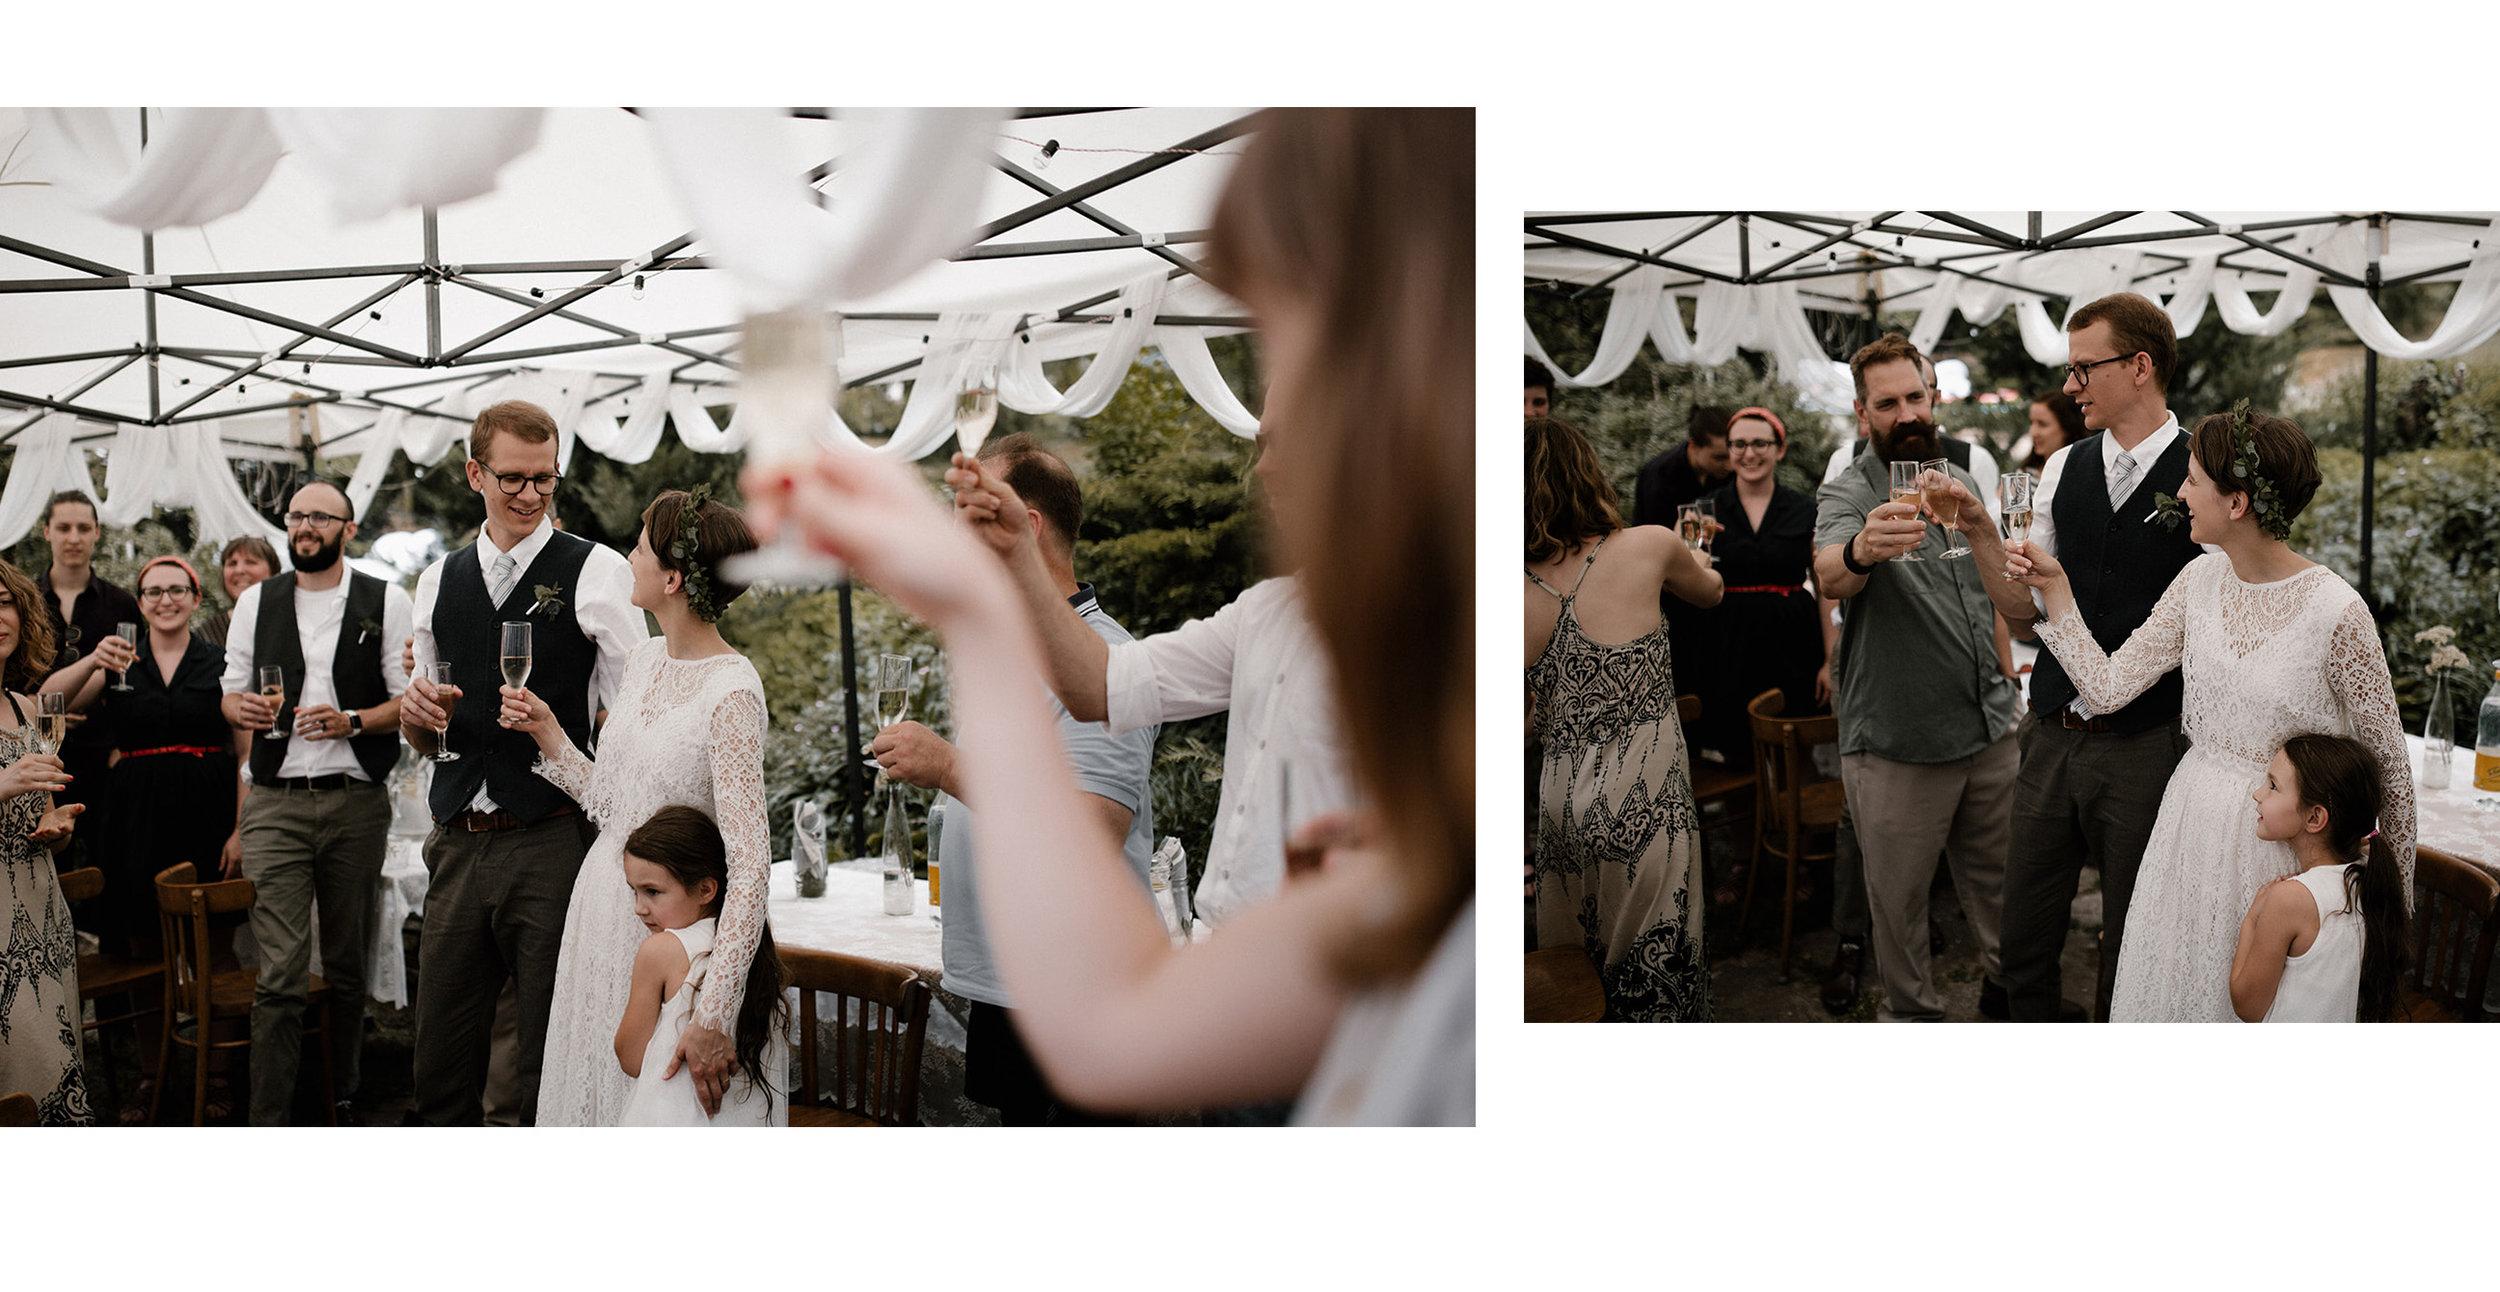 Jaja_Josh_wedding-564.jpg